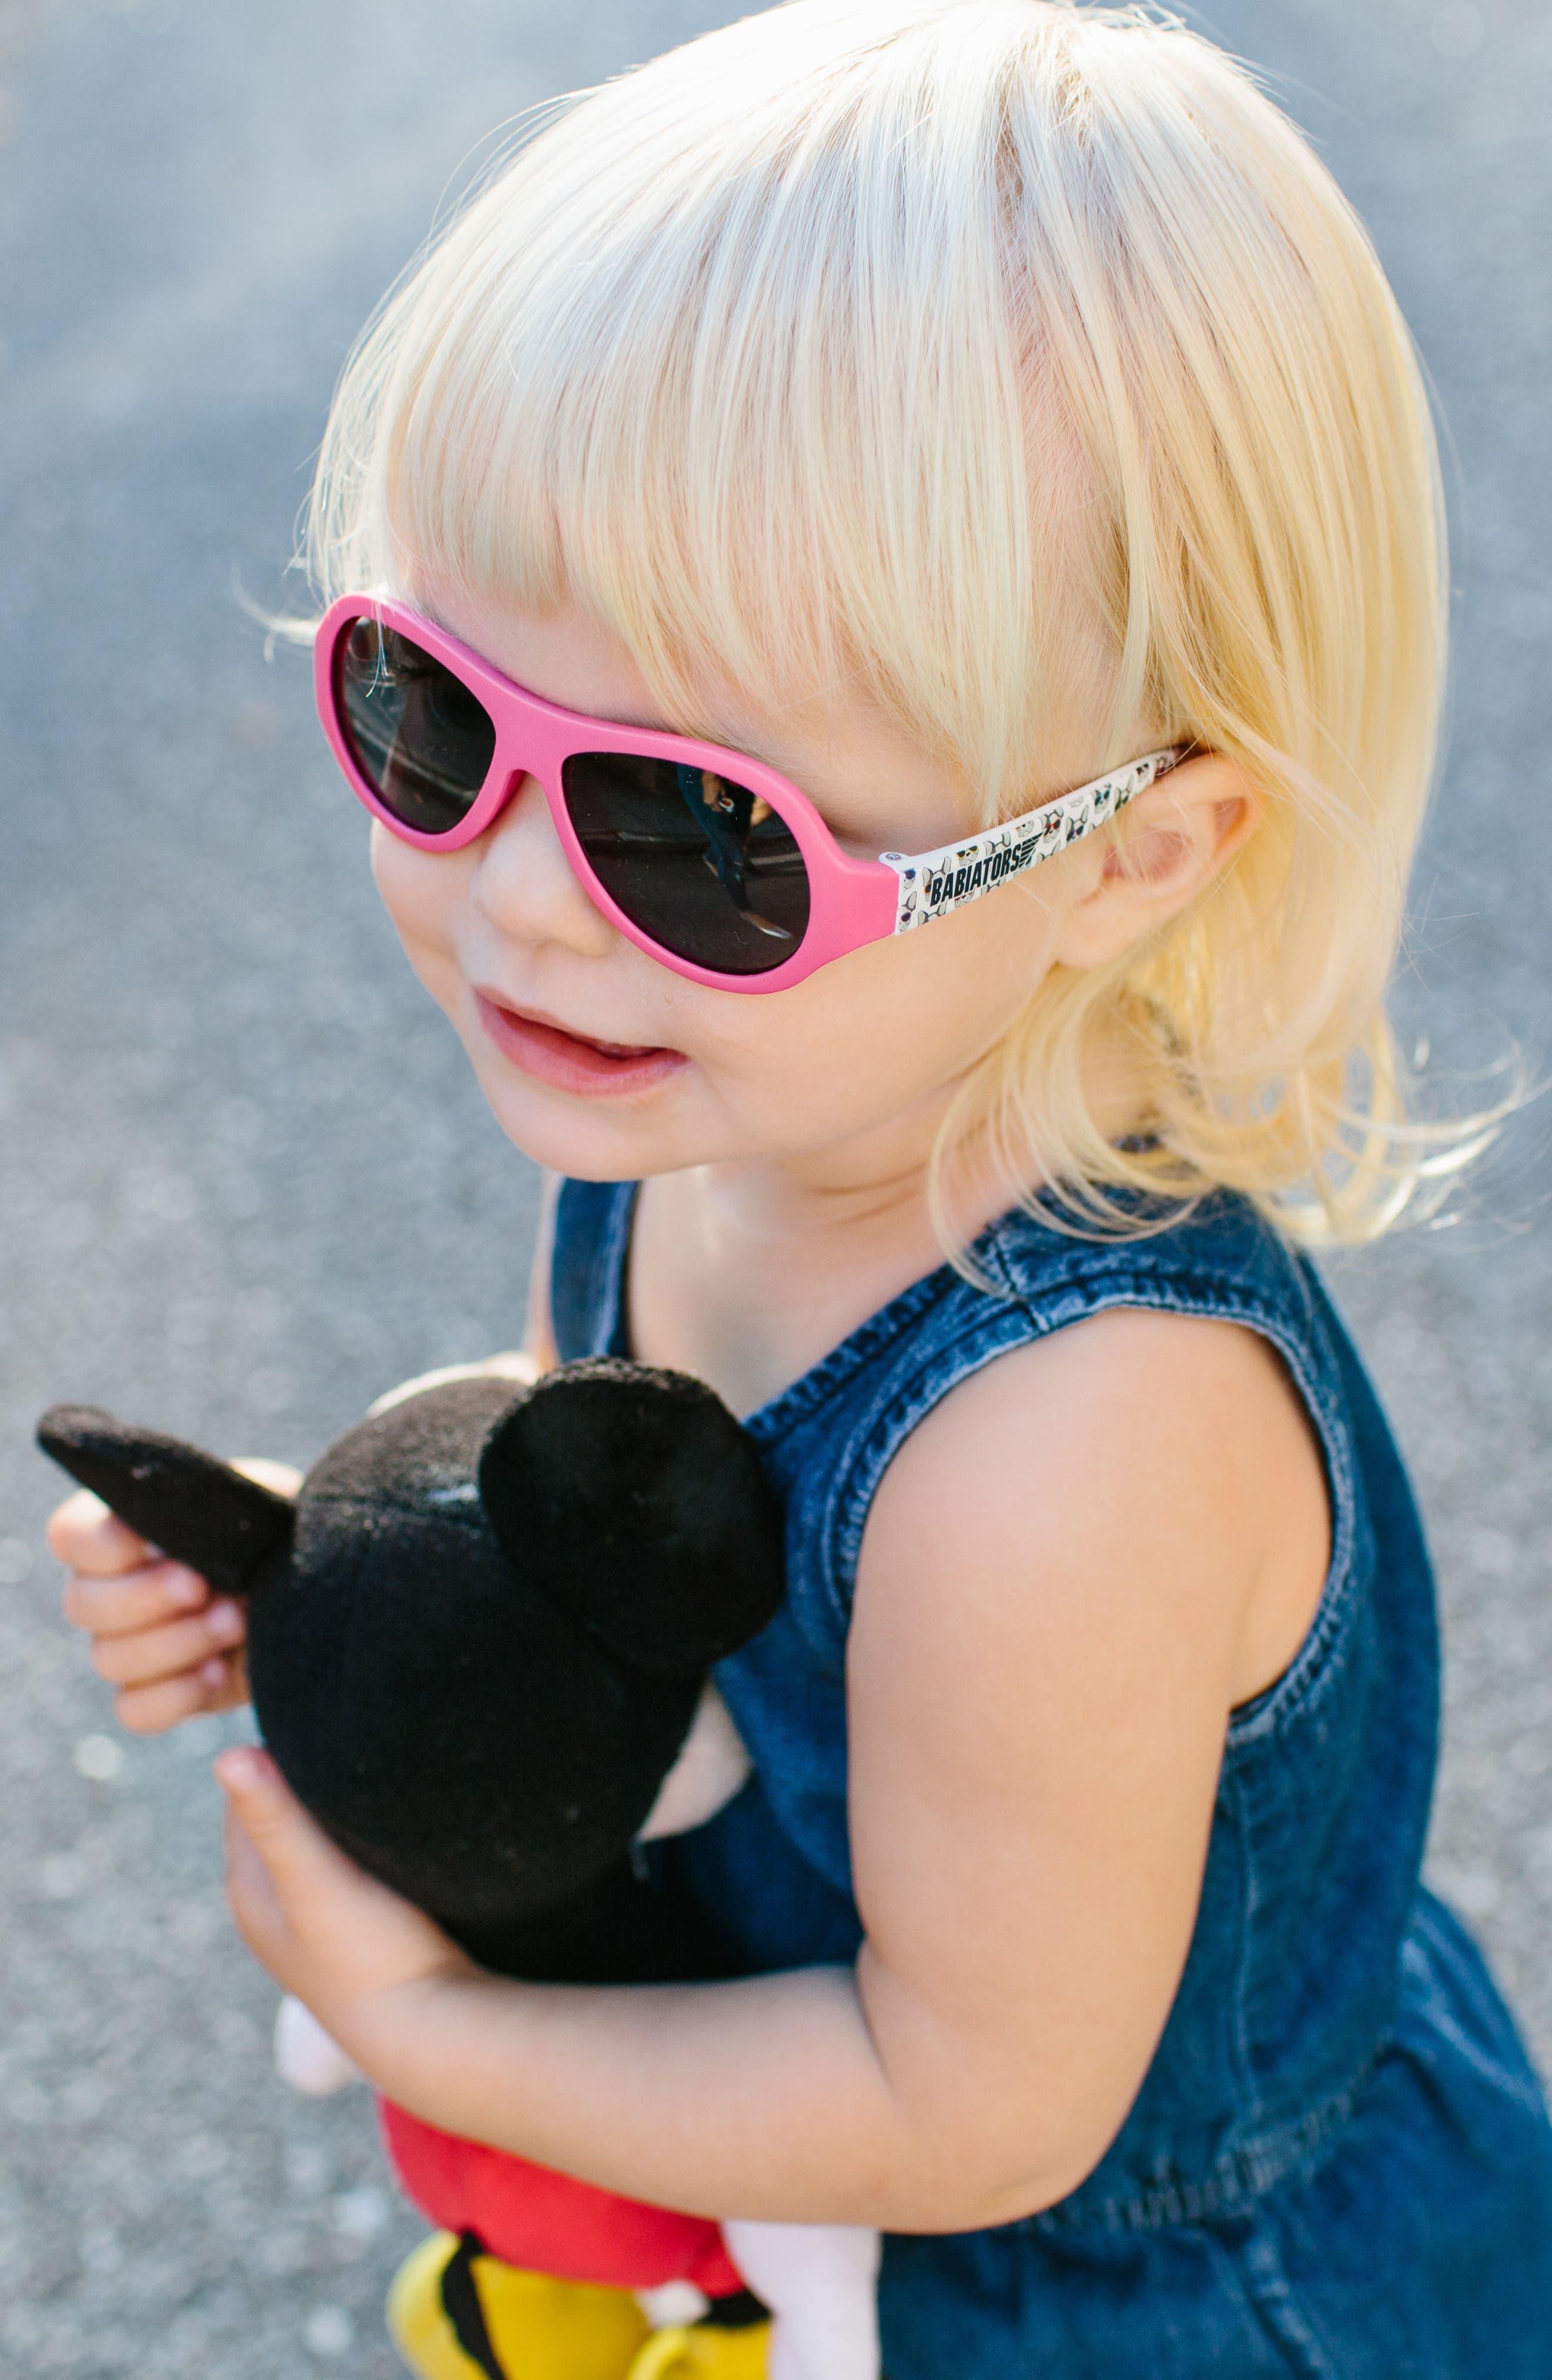 Puppy Print Polarized Aviator Sunglasses,                             Alternate thumbnail 5, color,                             Puppy Love